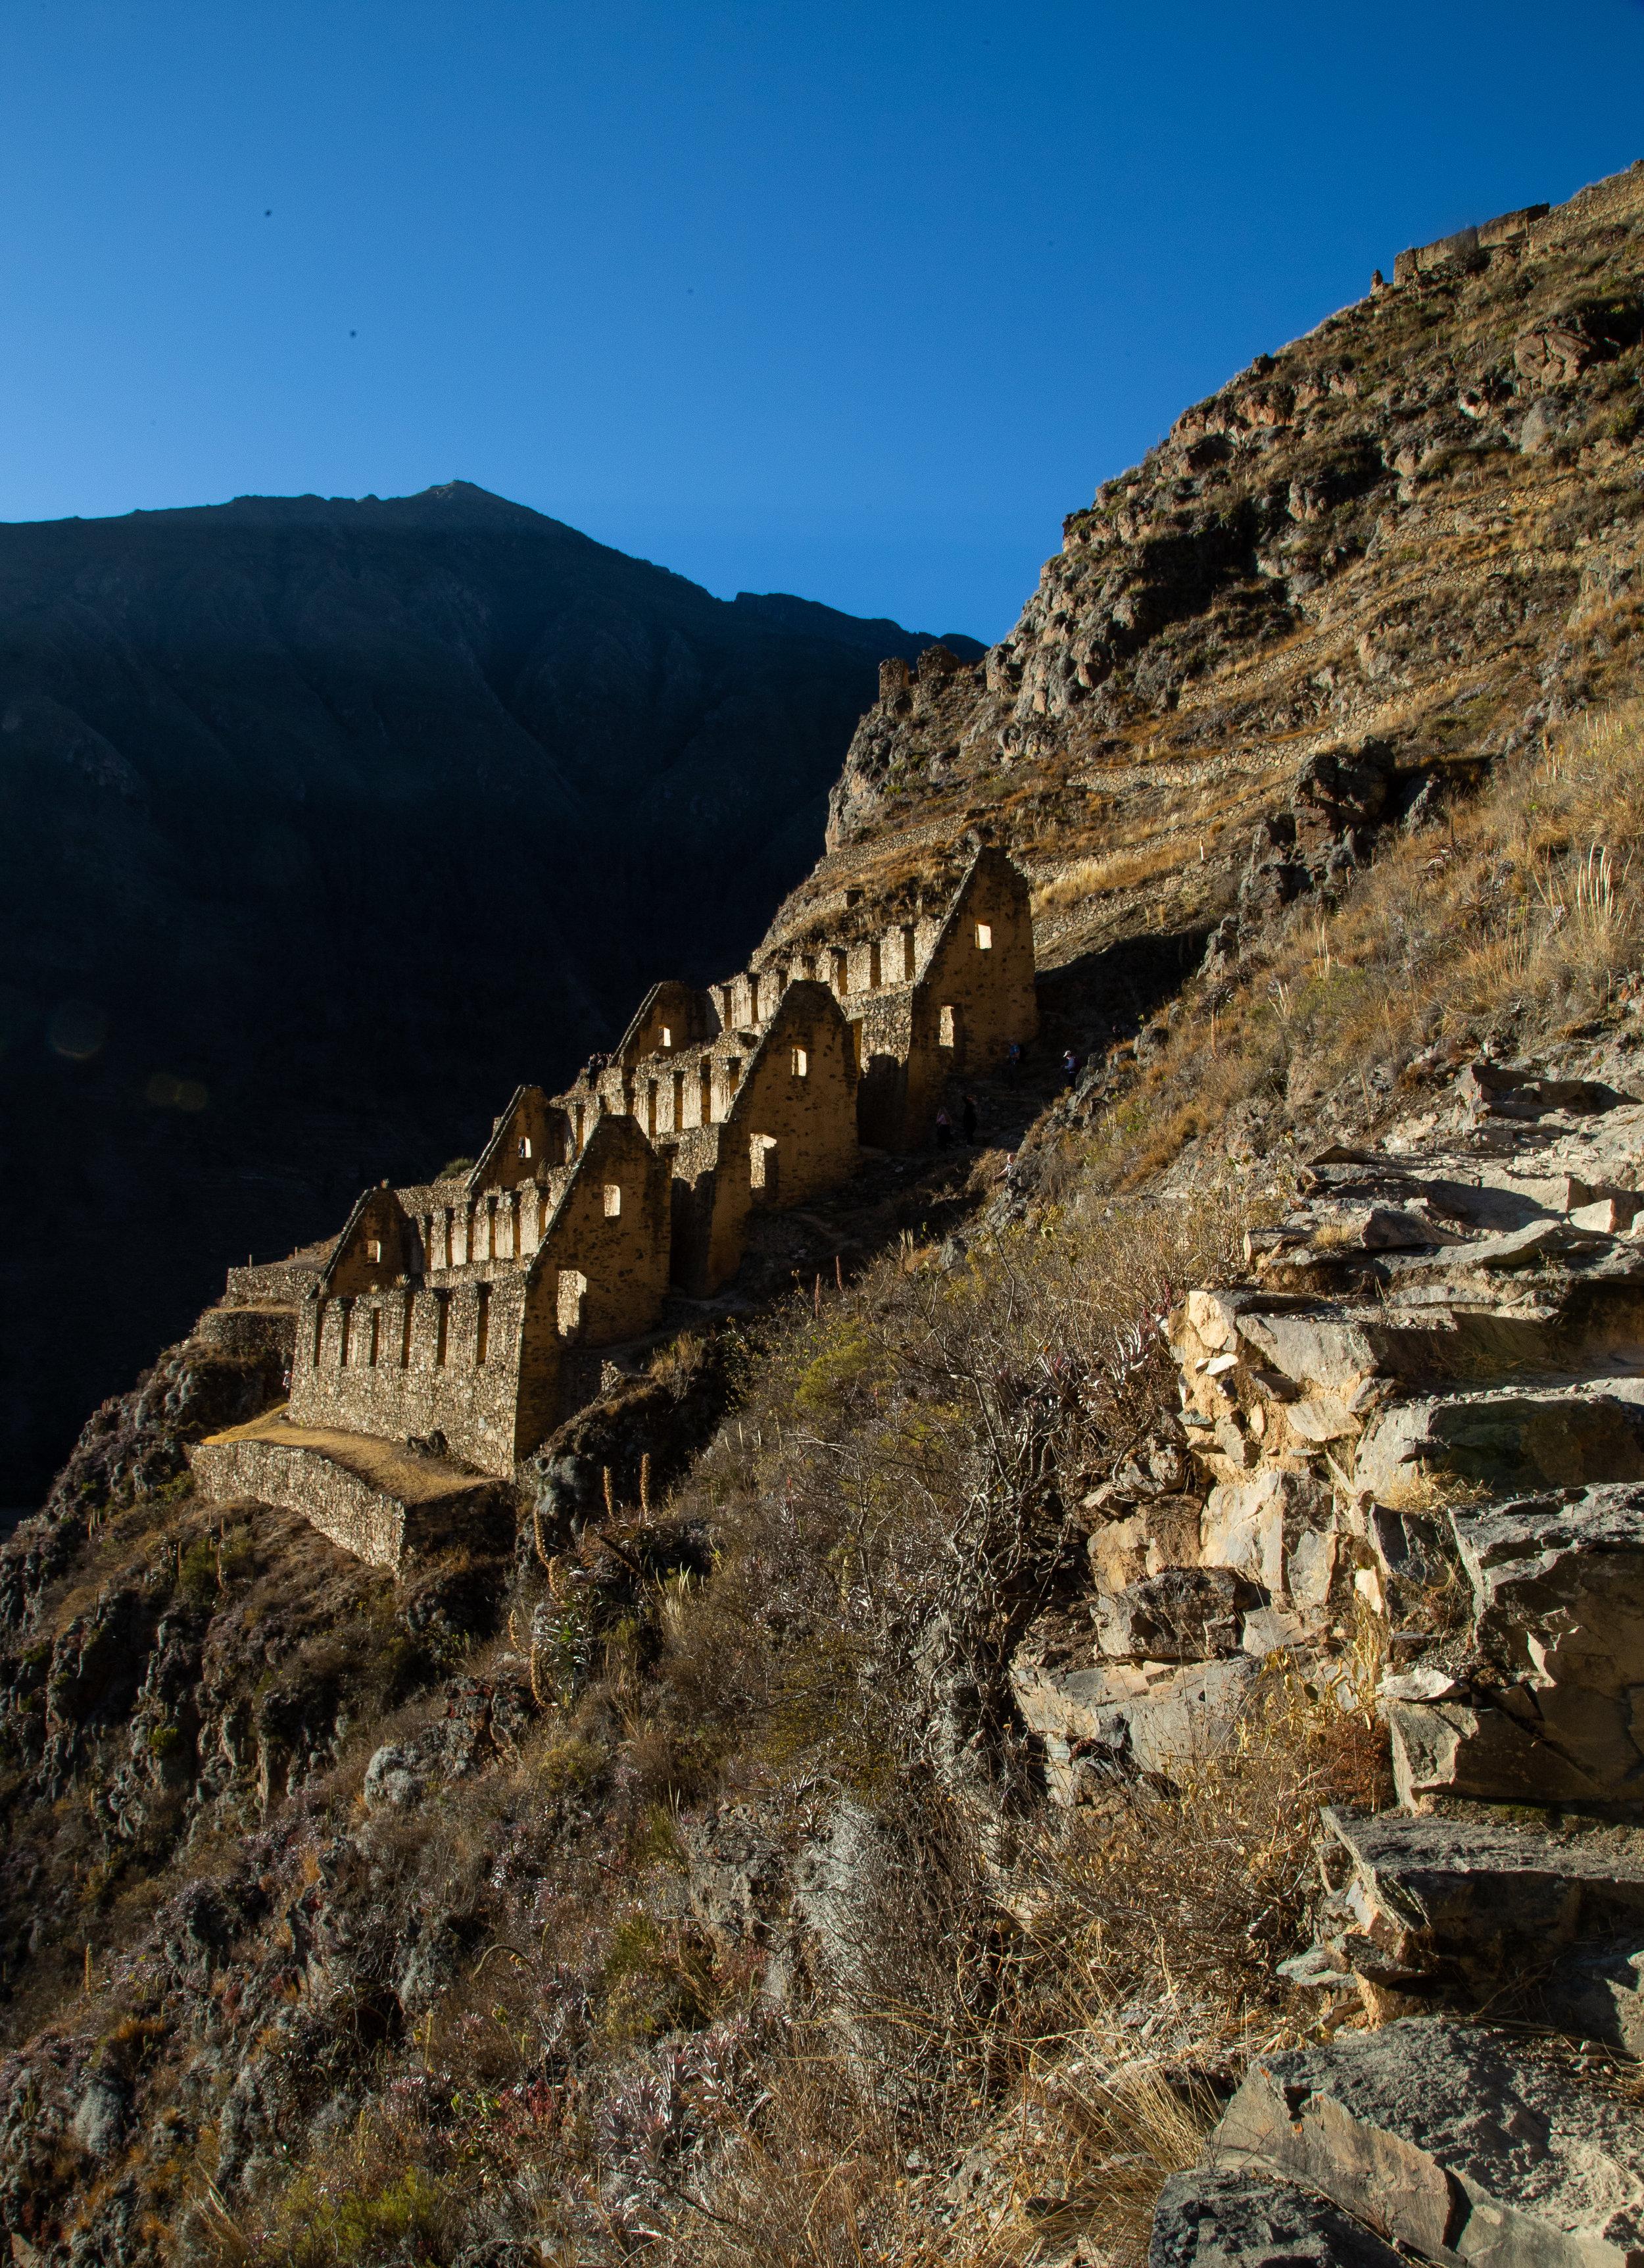 Hiking Ruins - Ollantaytambo, Cusco Region